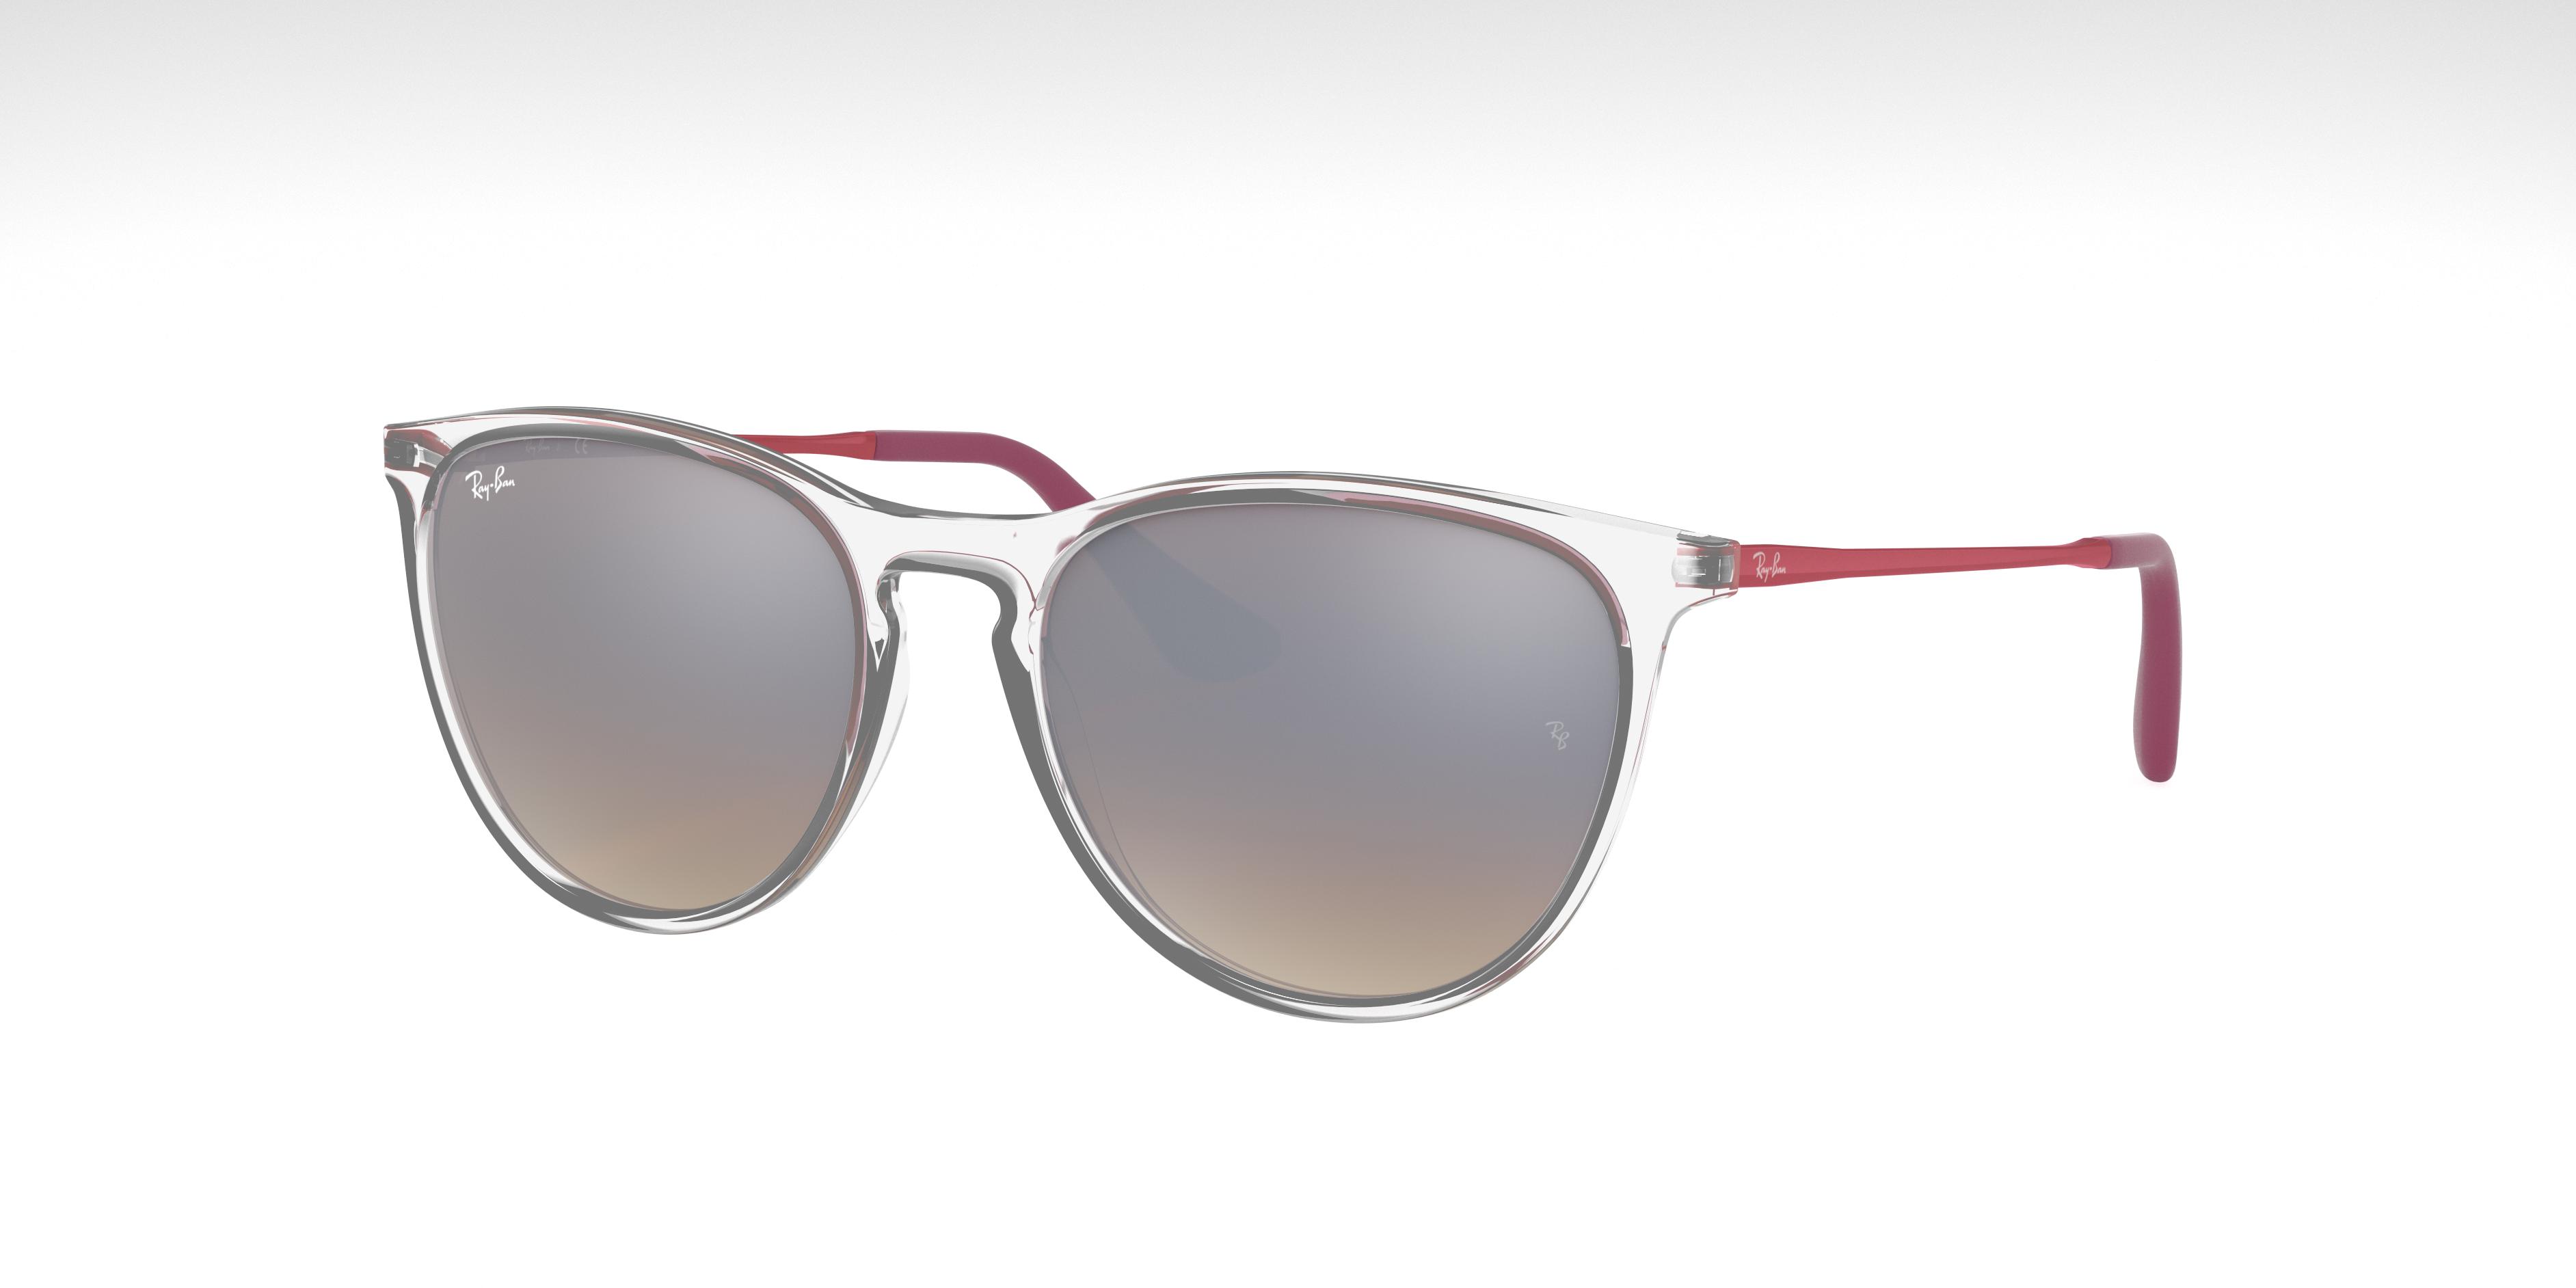 Ray-Ban Izzy Purple-Reddish, Gray Lenses - RJ9060S